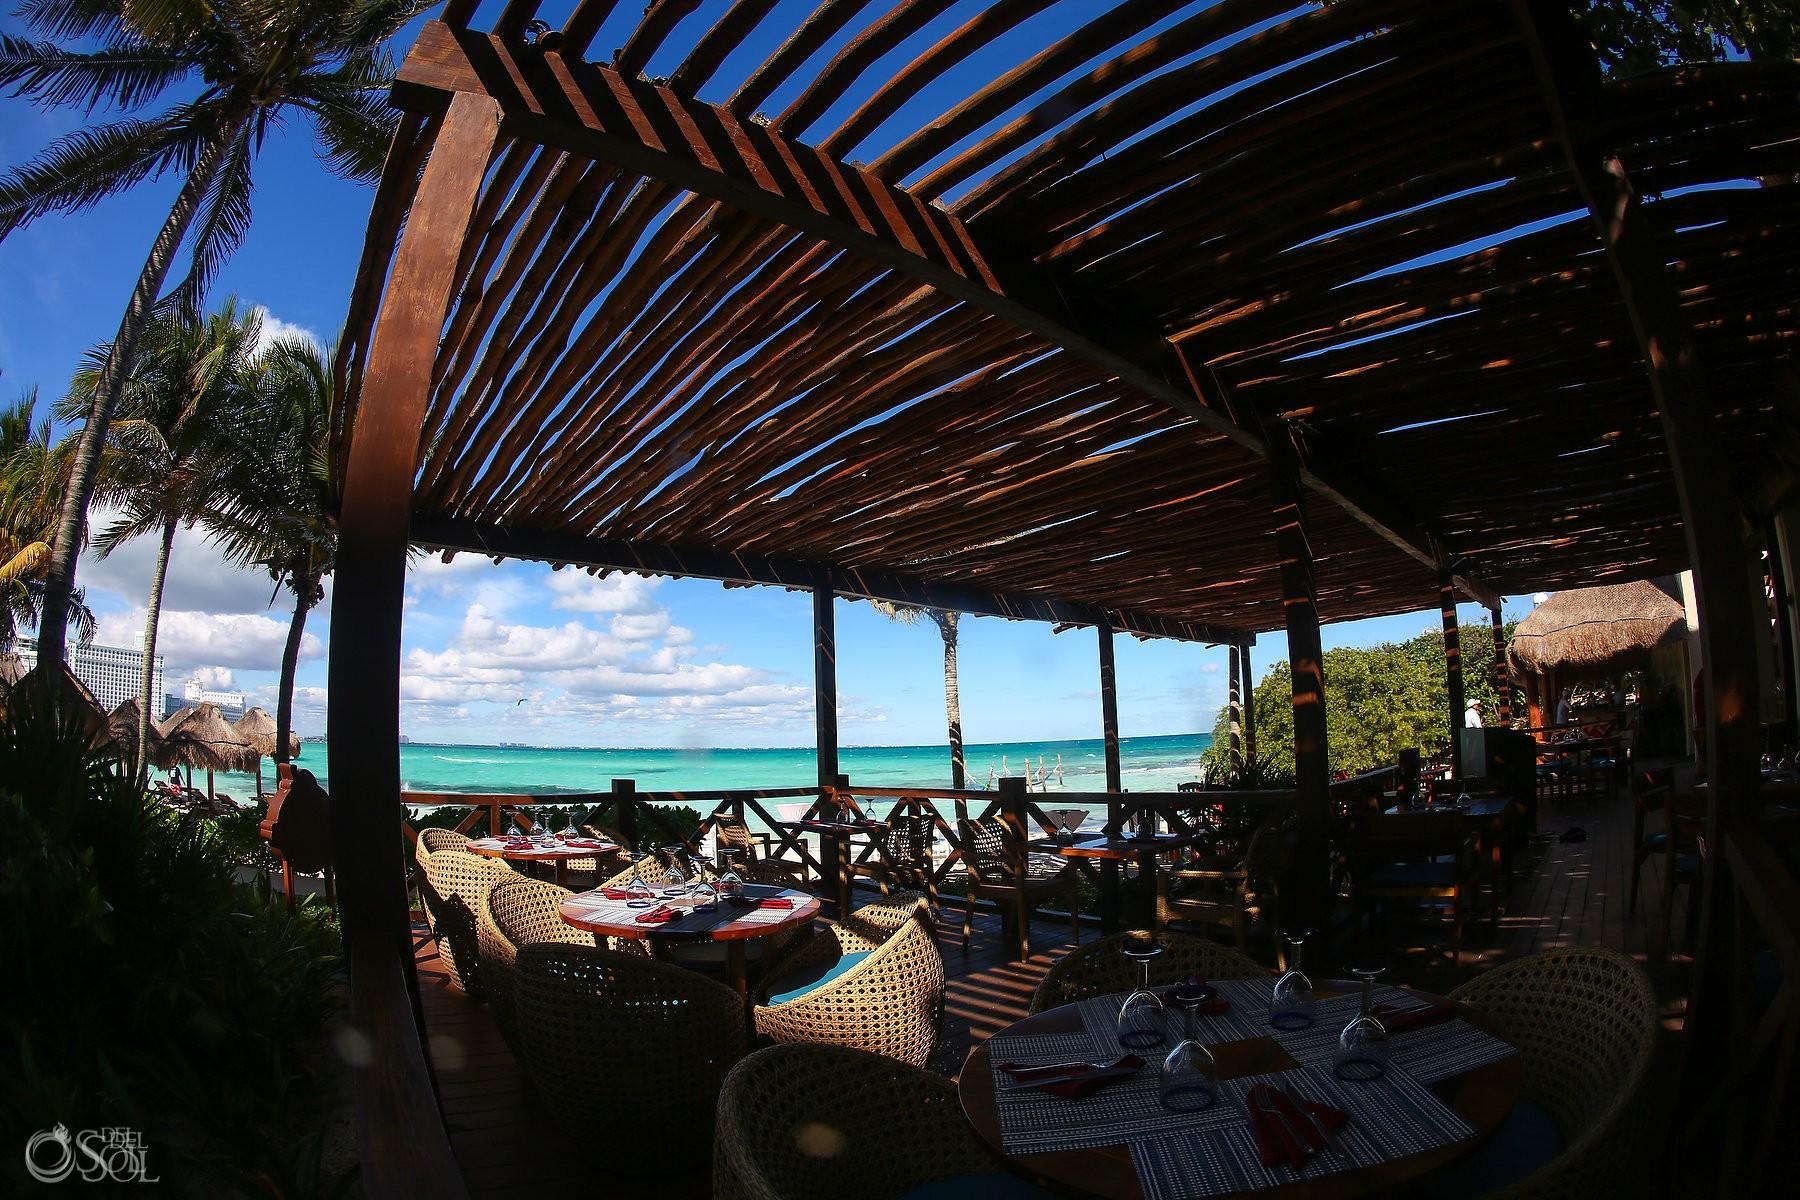 Terrace at Hyatt Ziva destination wedding luxury hotel Cancun Mexico